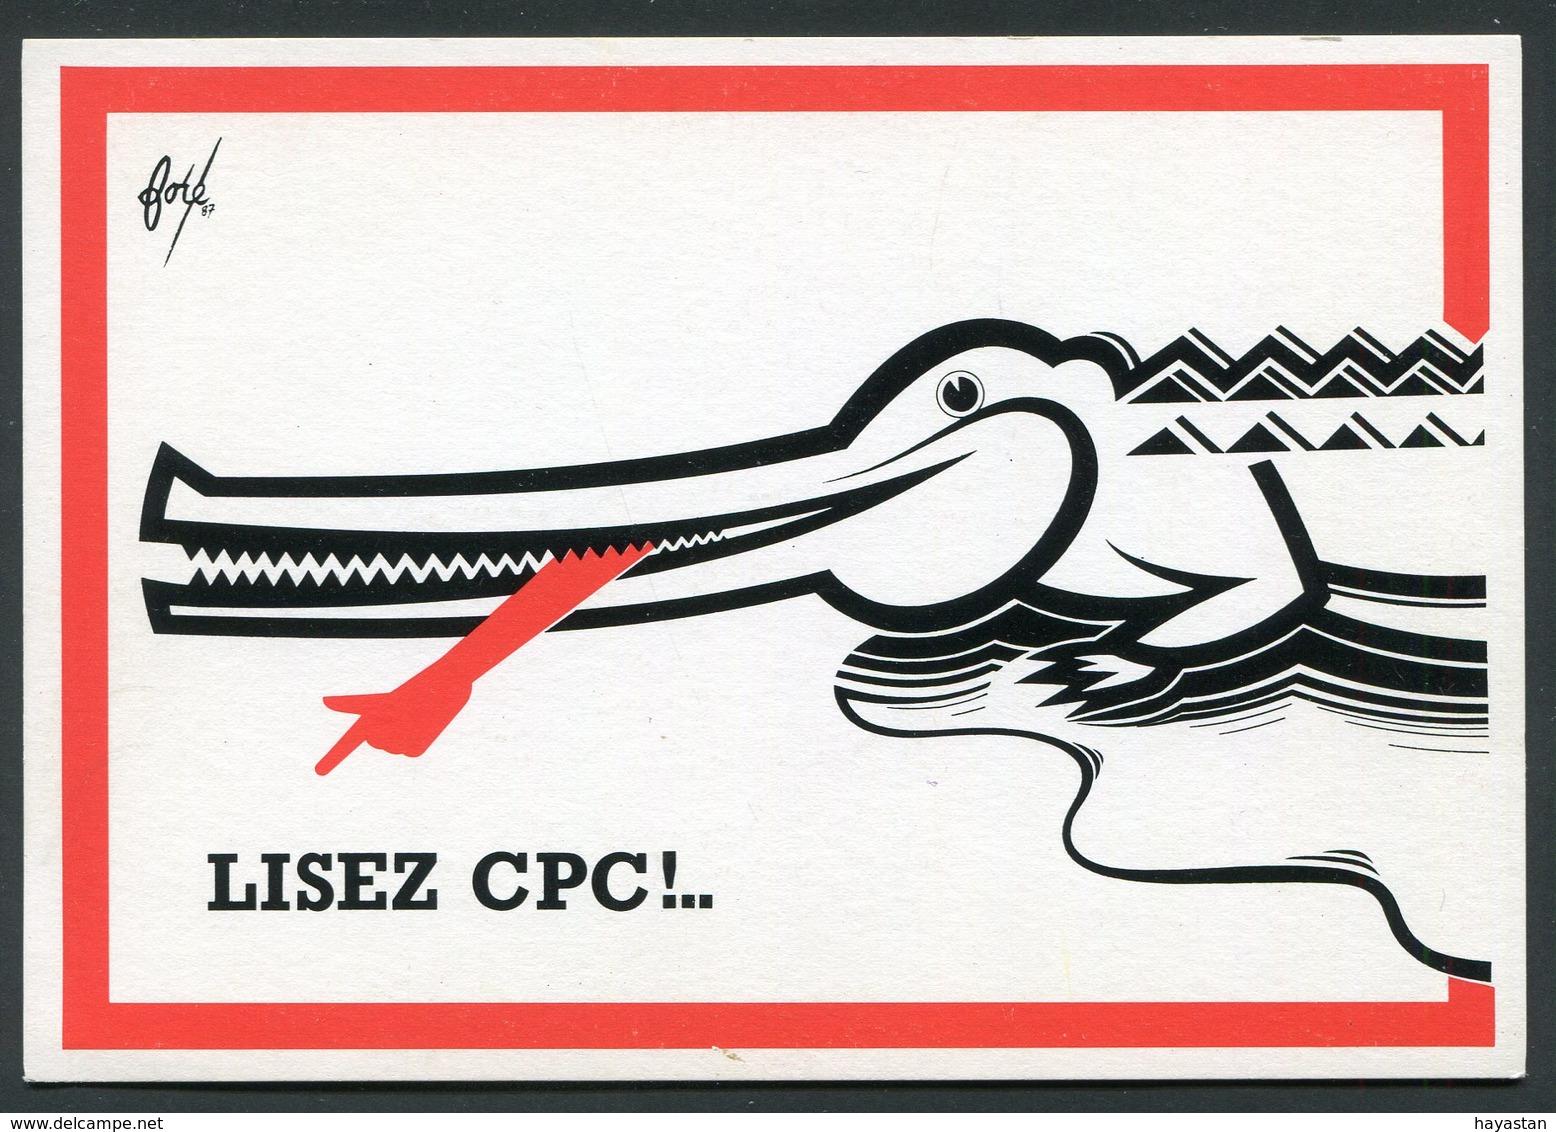 LISEZ CPC - CARTES POSTALES ET COLLECTIONS - DESSIN DE FORE - 1987 - French